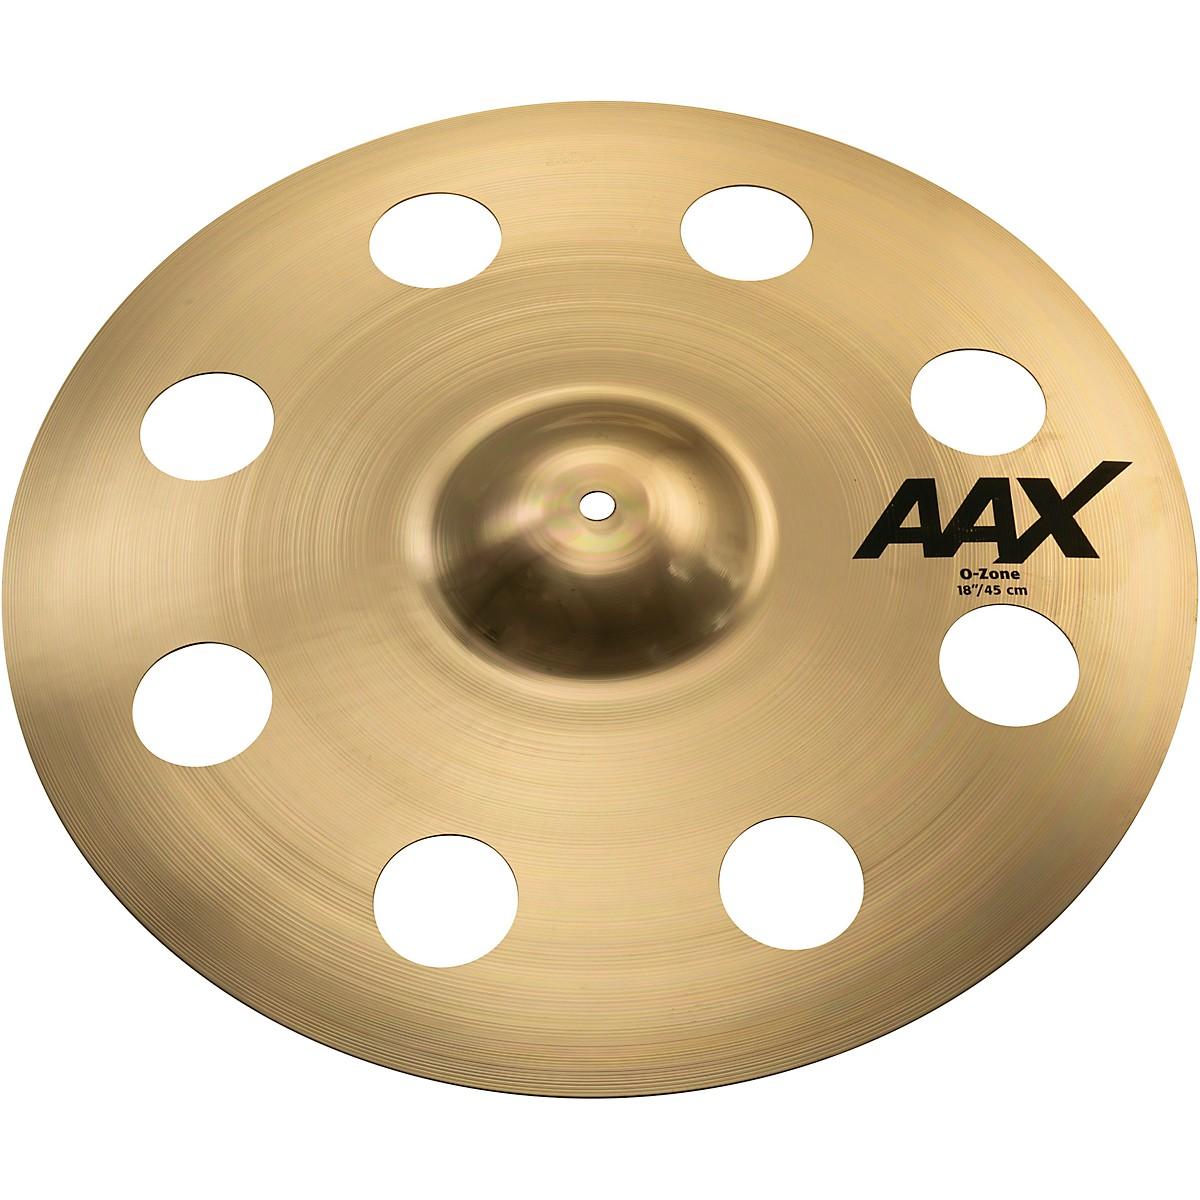 Sabian AAX O-Zone Crash Brilliant Cymbal